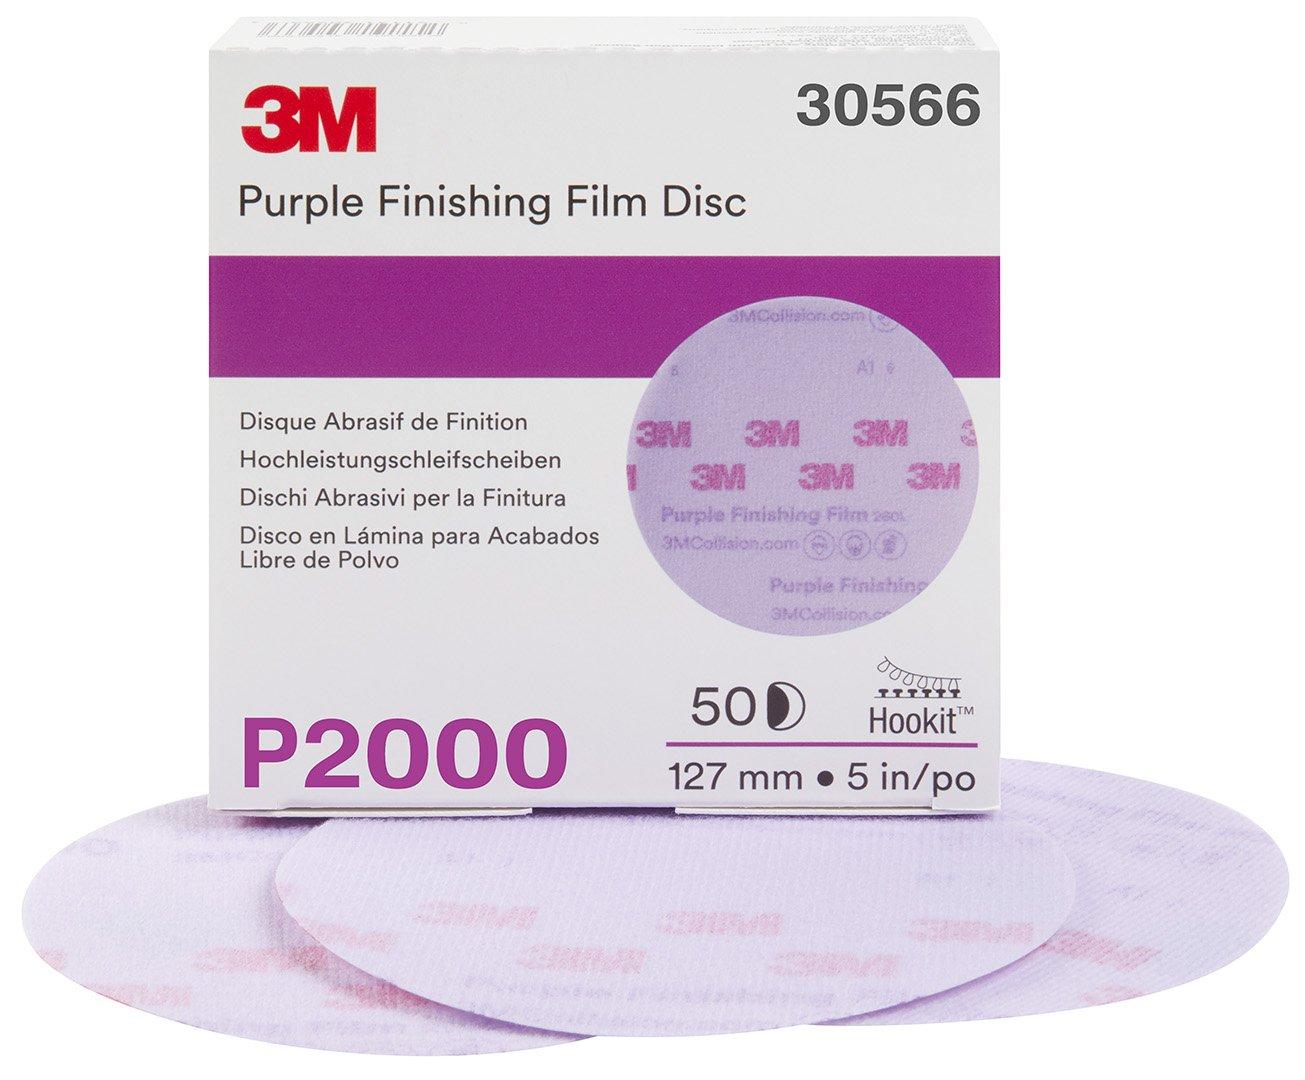 3M 30566-50PK Hookit 5'' Purple Finishing Film Disc, (Pack of 50) by 3M (Image #2)